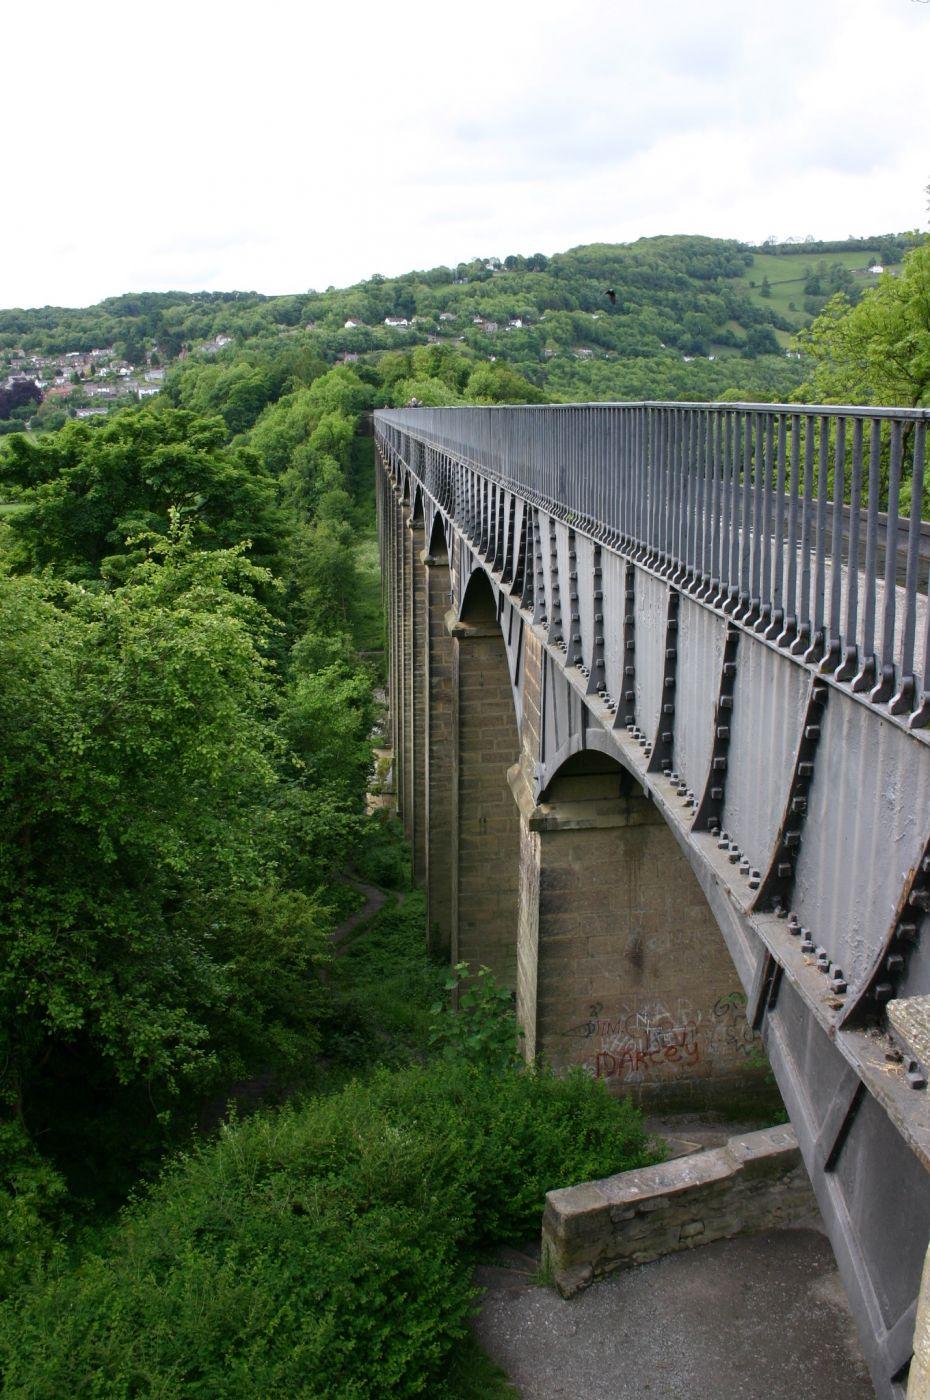 Pontcysyllte Aqueduct, United Kingdom